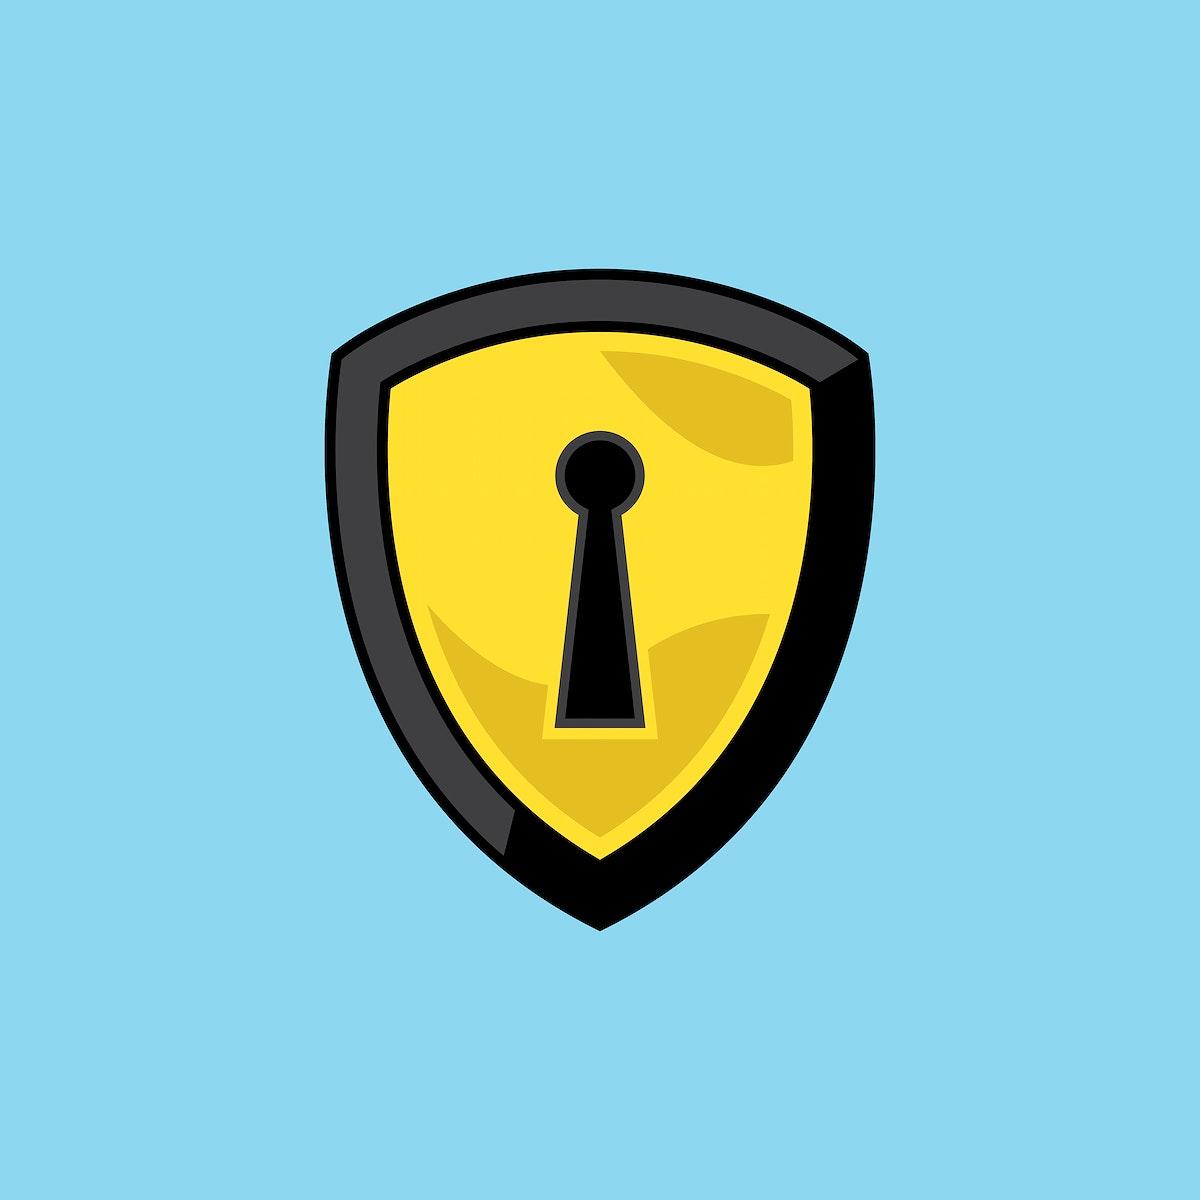 Shield with lock icon illustration